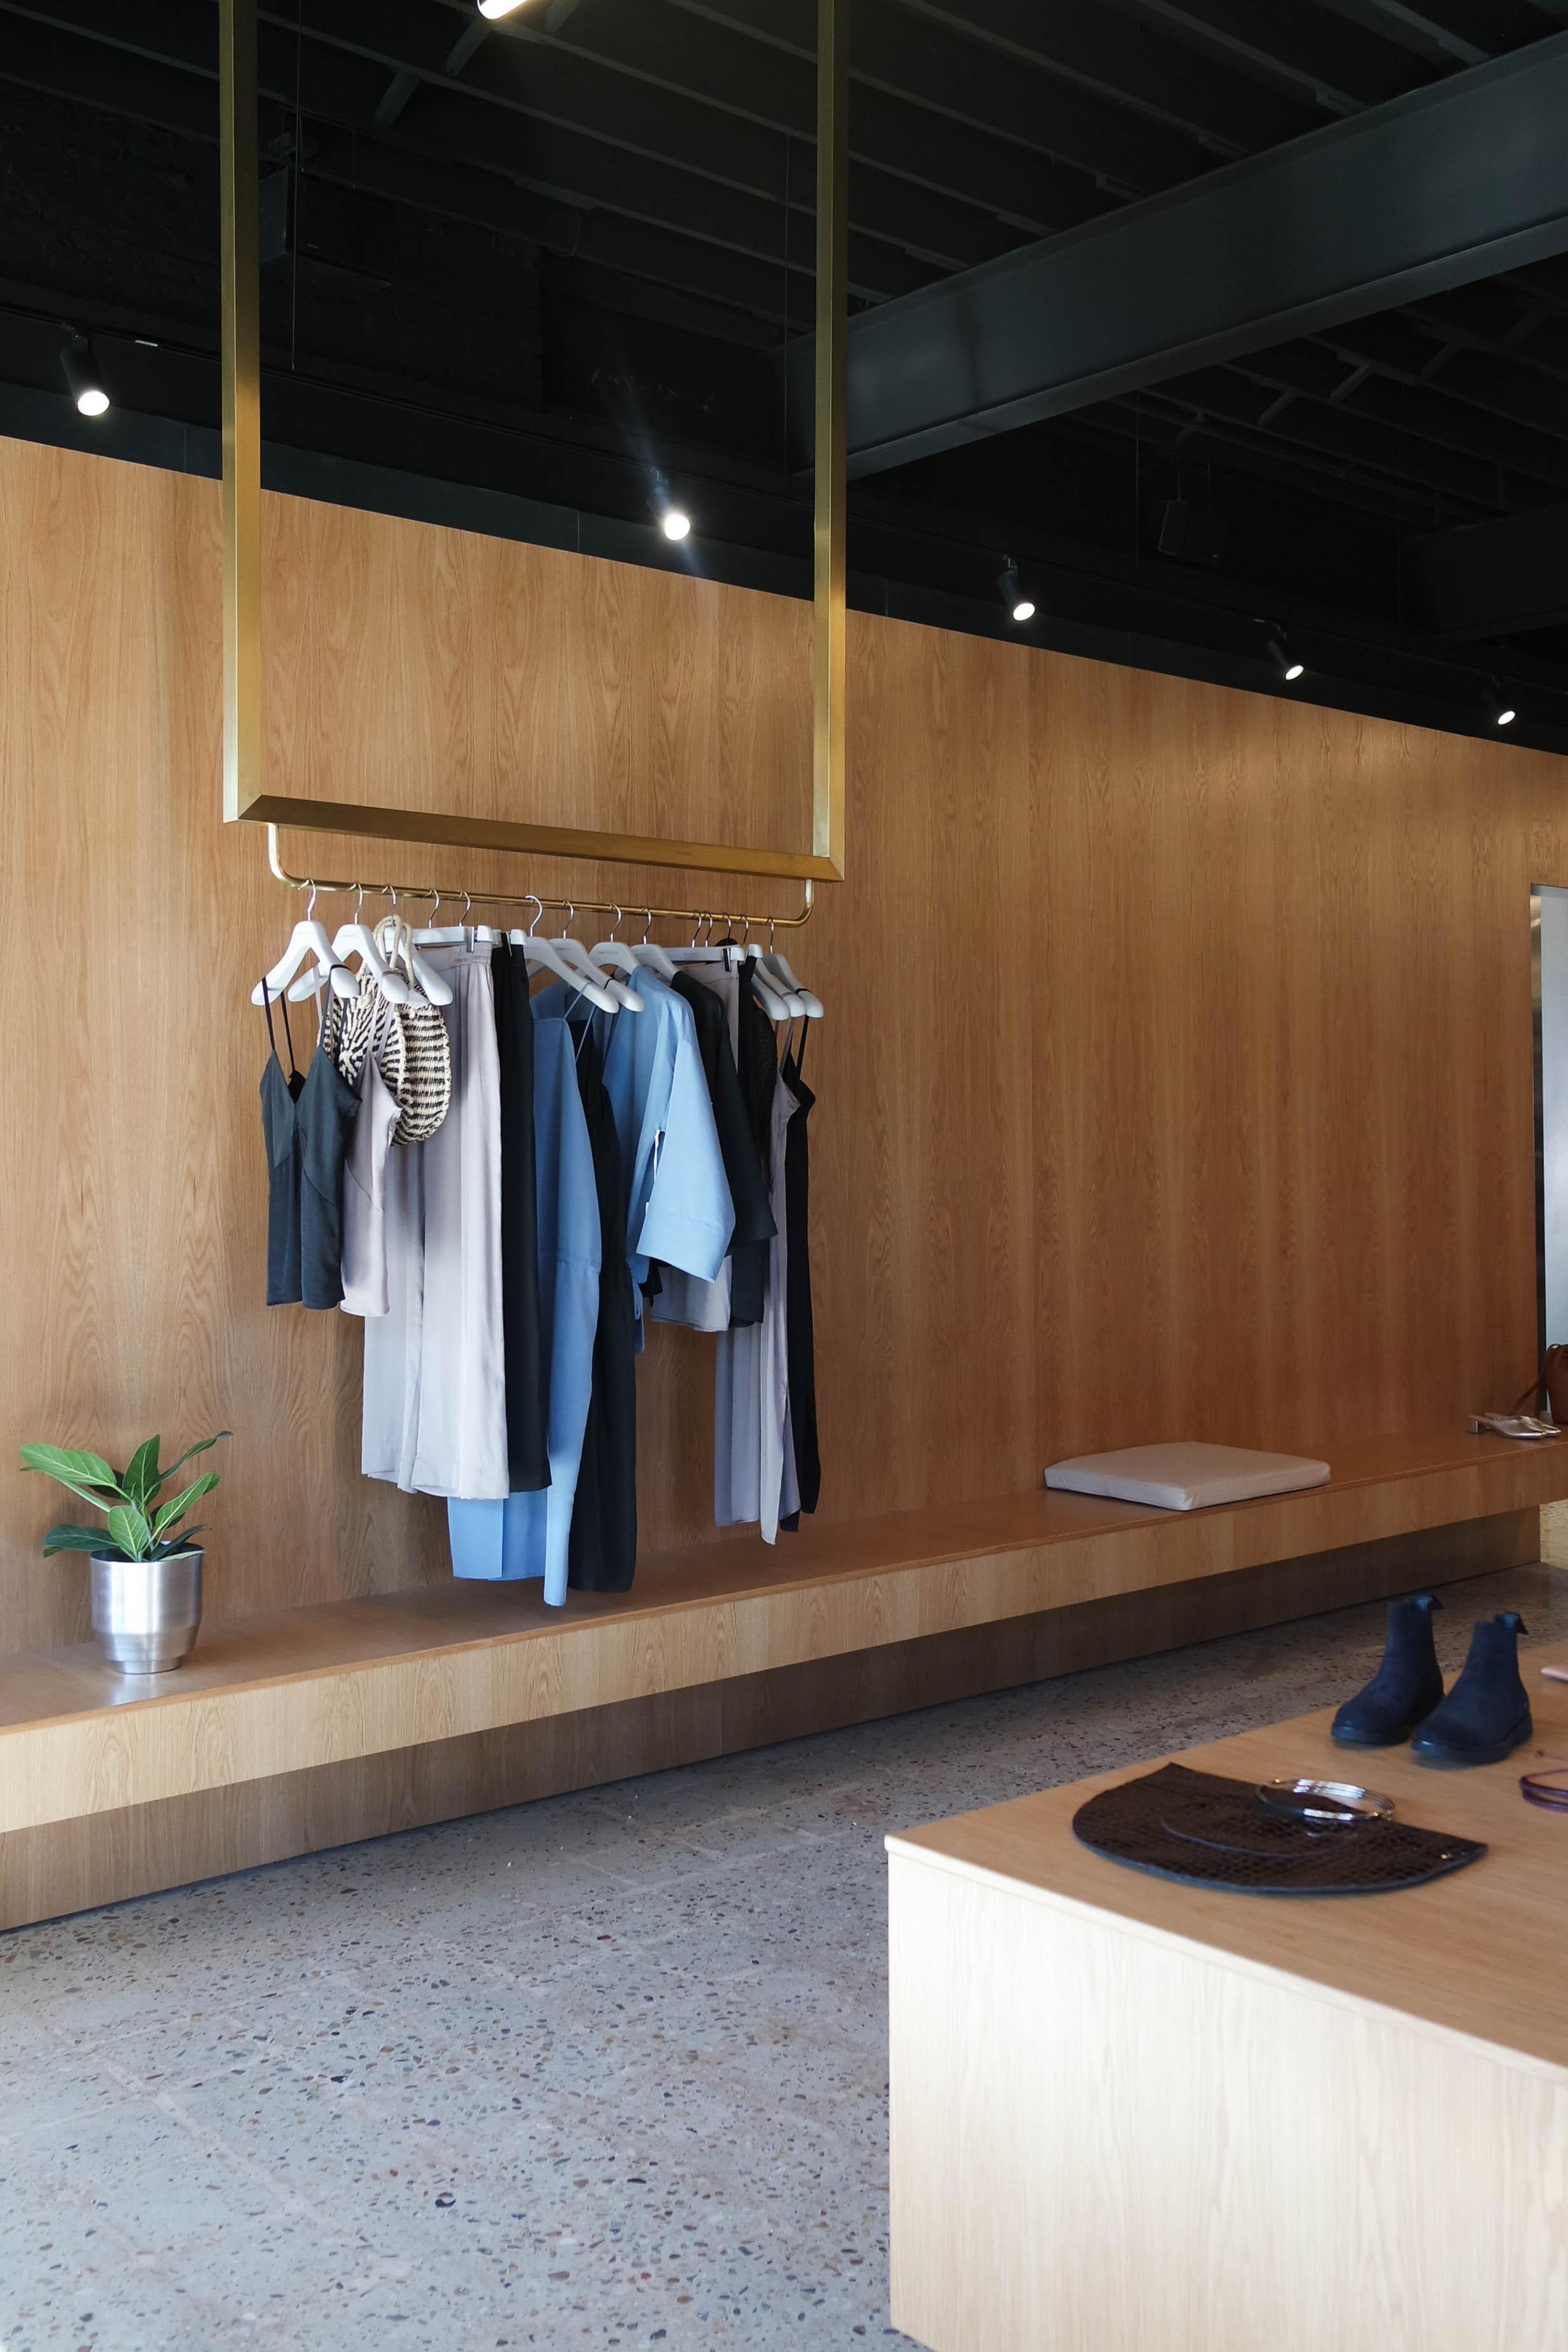 liquidators richmond ideas remodeling interior design room for home at decor cool designers simple va